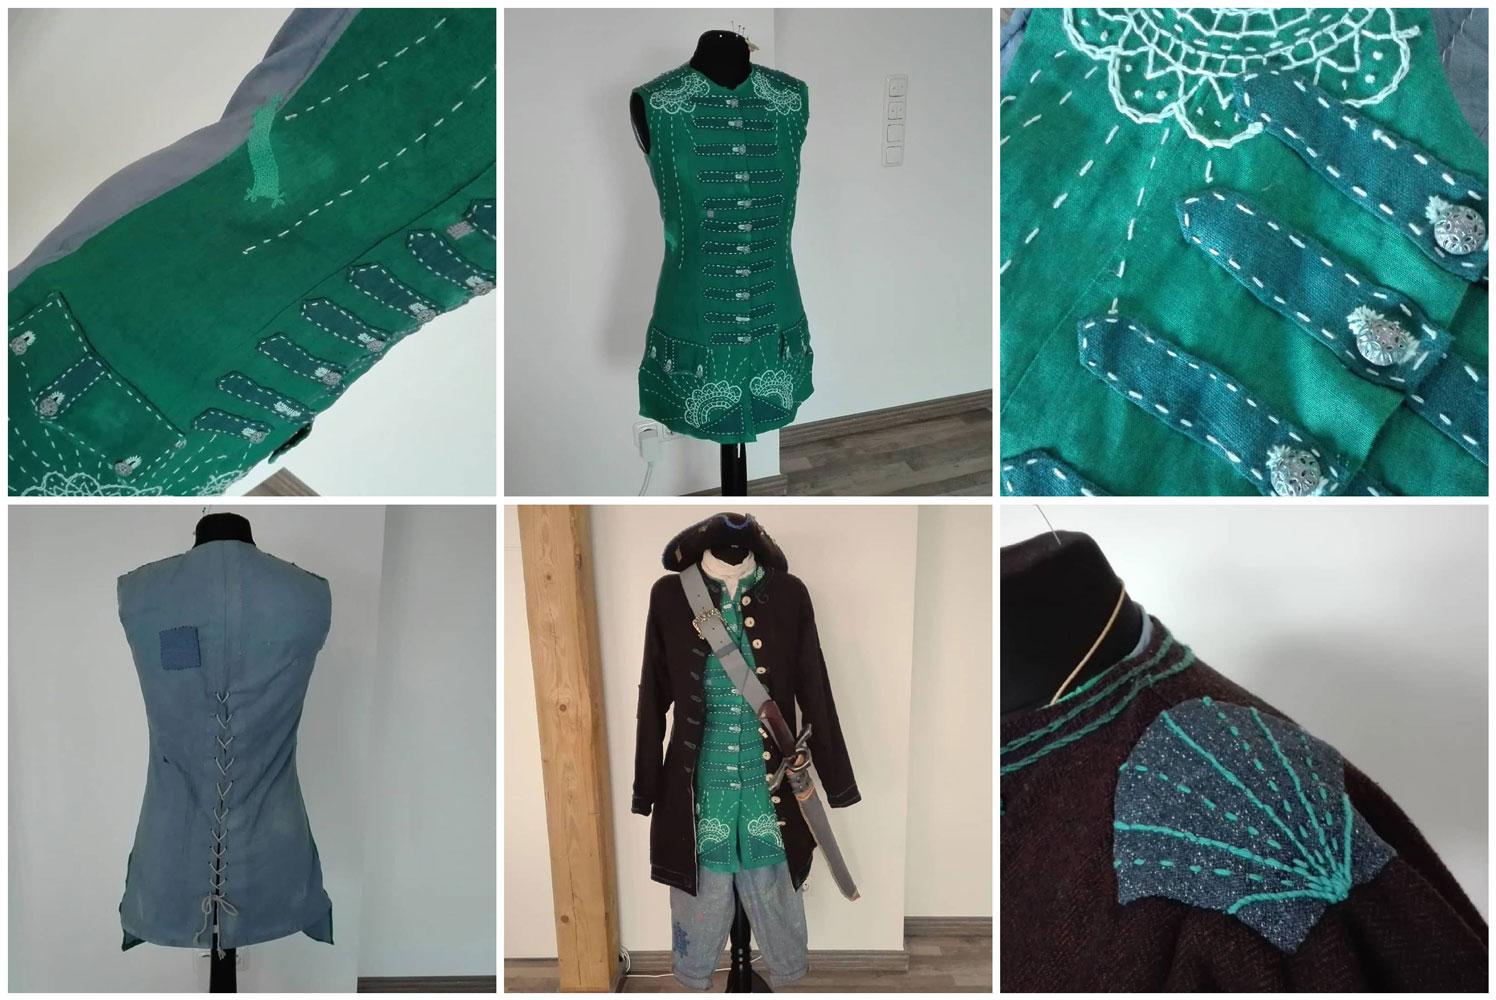 Dekorative Seefahrerkleidung als Inspiration